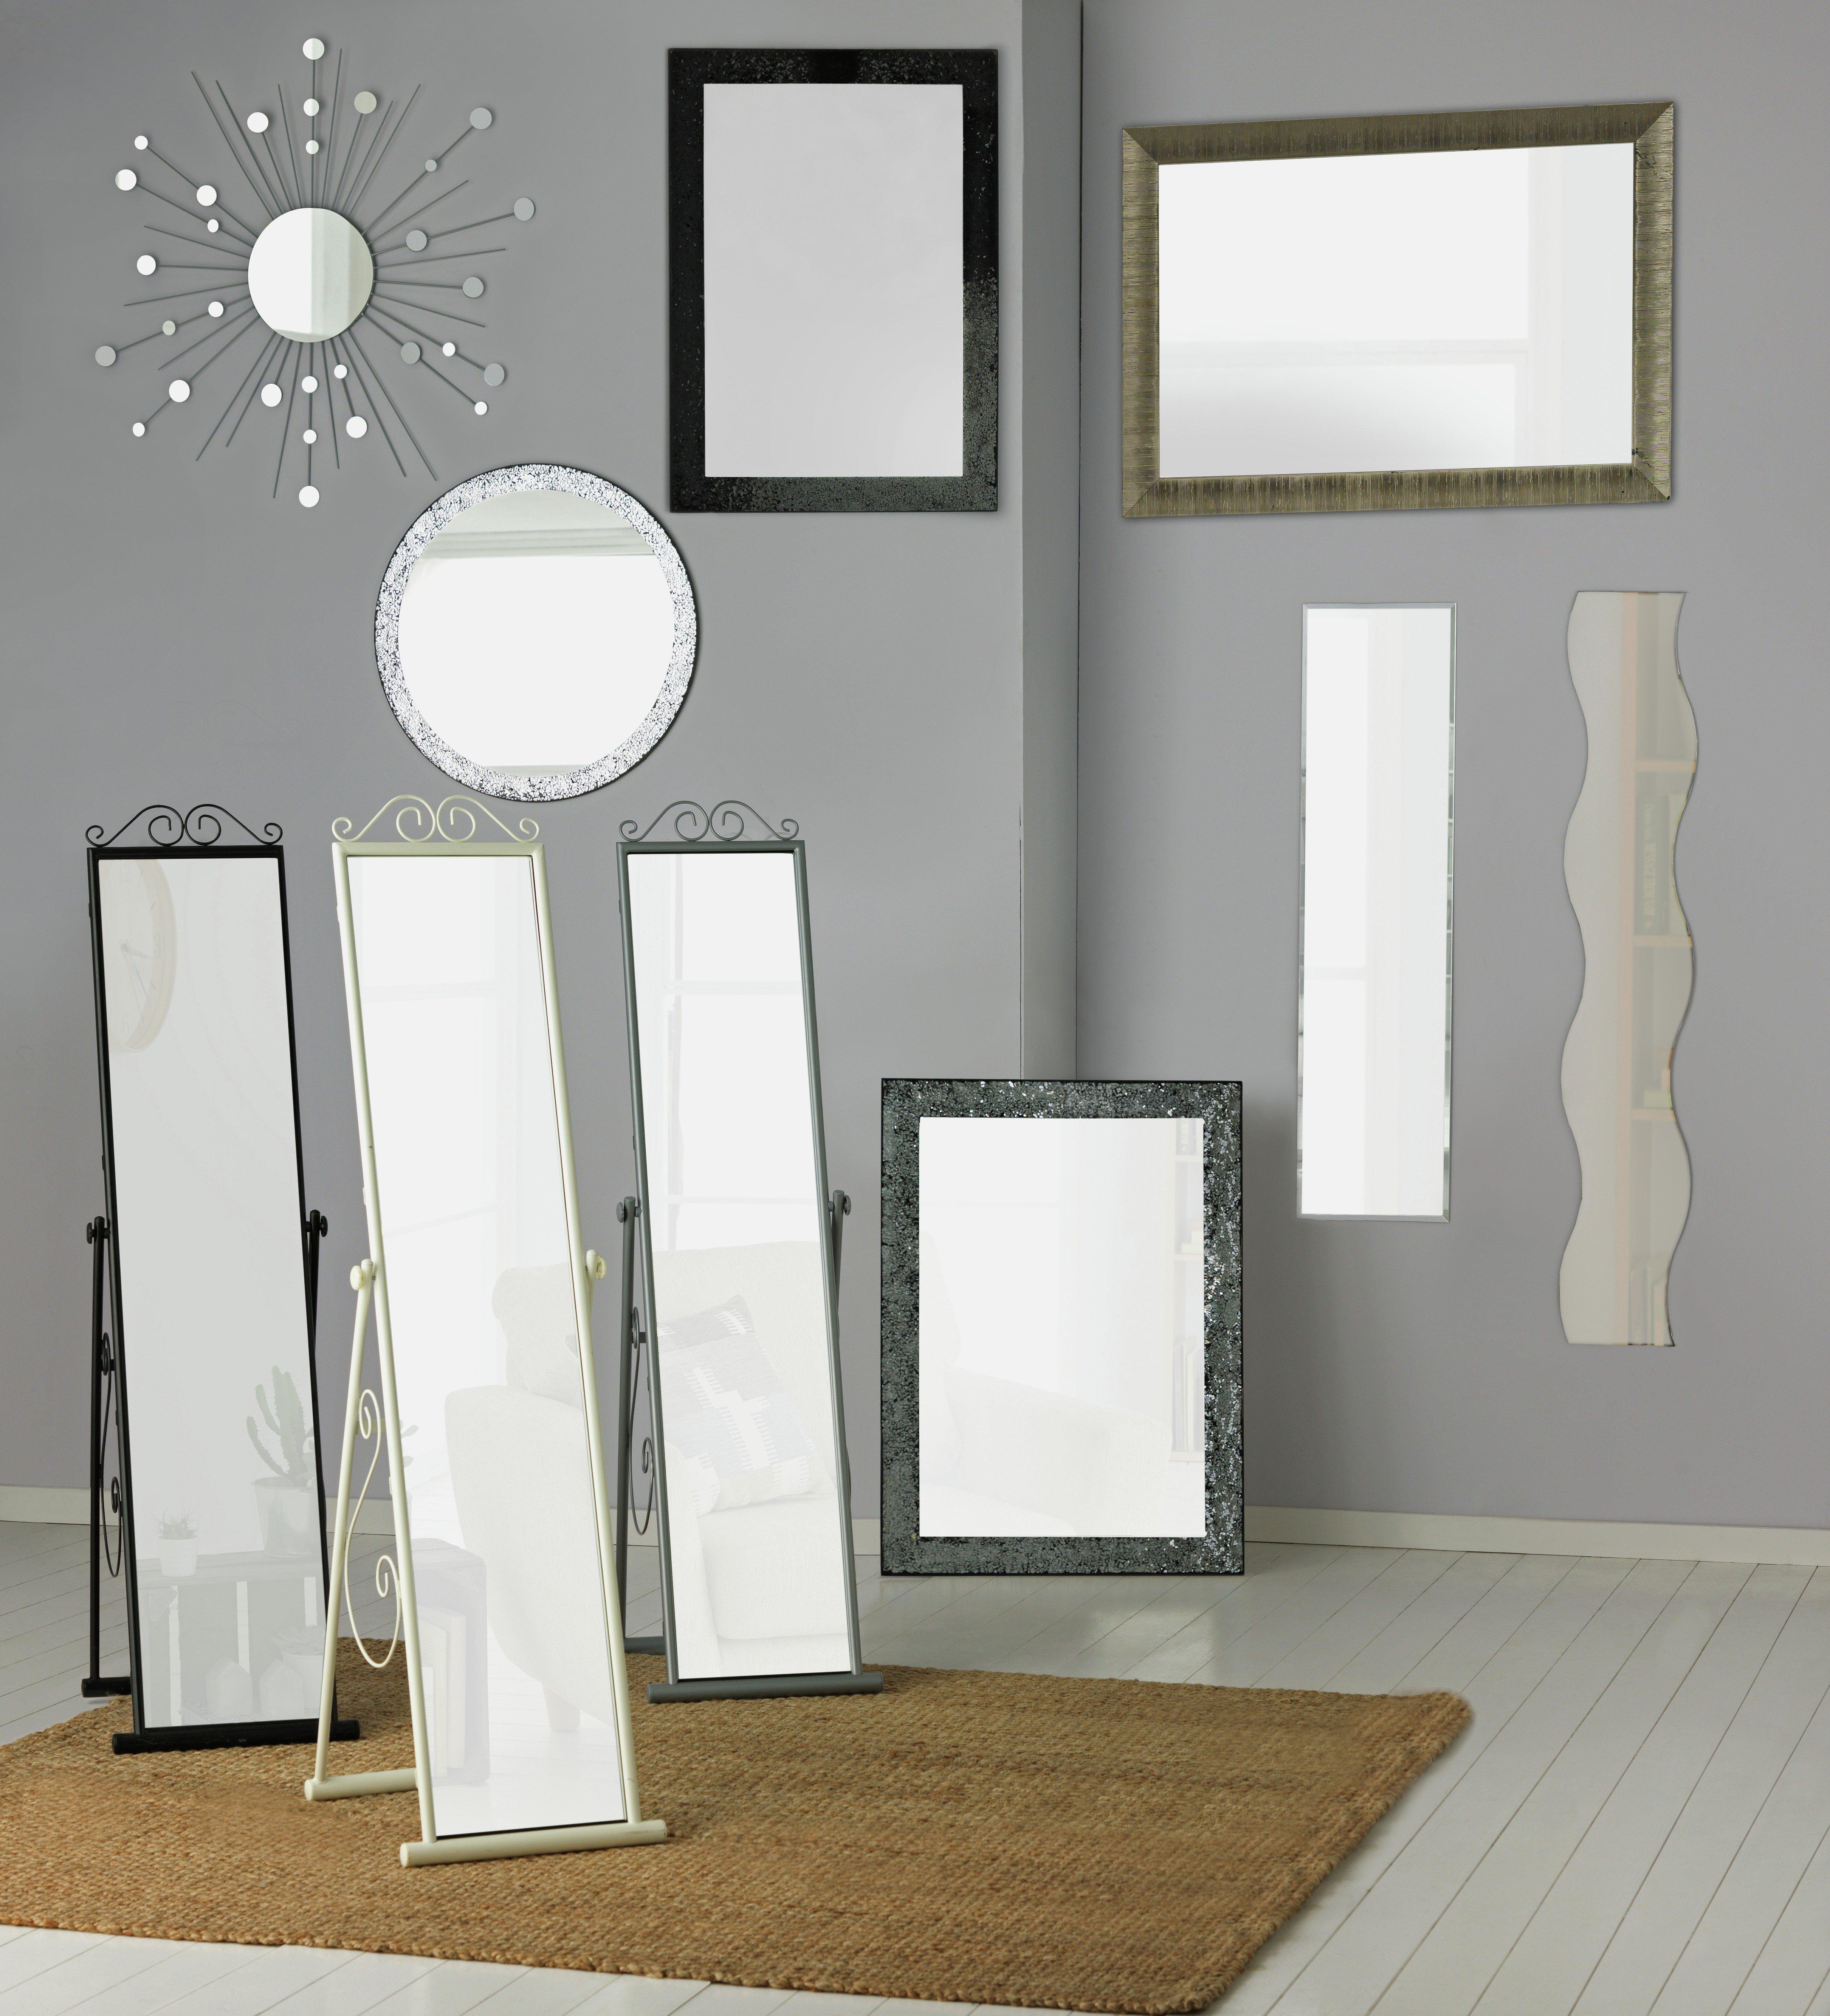 Frameless Wall Mirror buy home full length frameless wall mirror at argos.co.uk - your